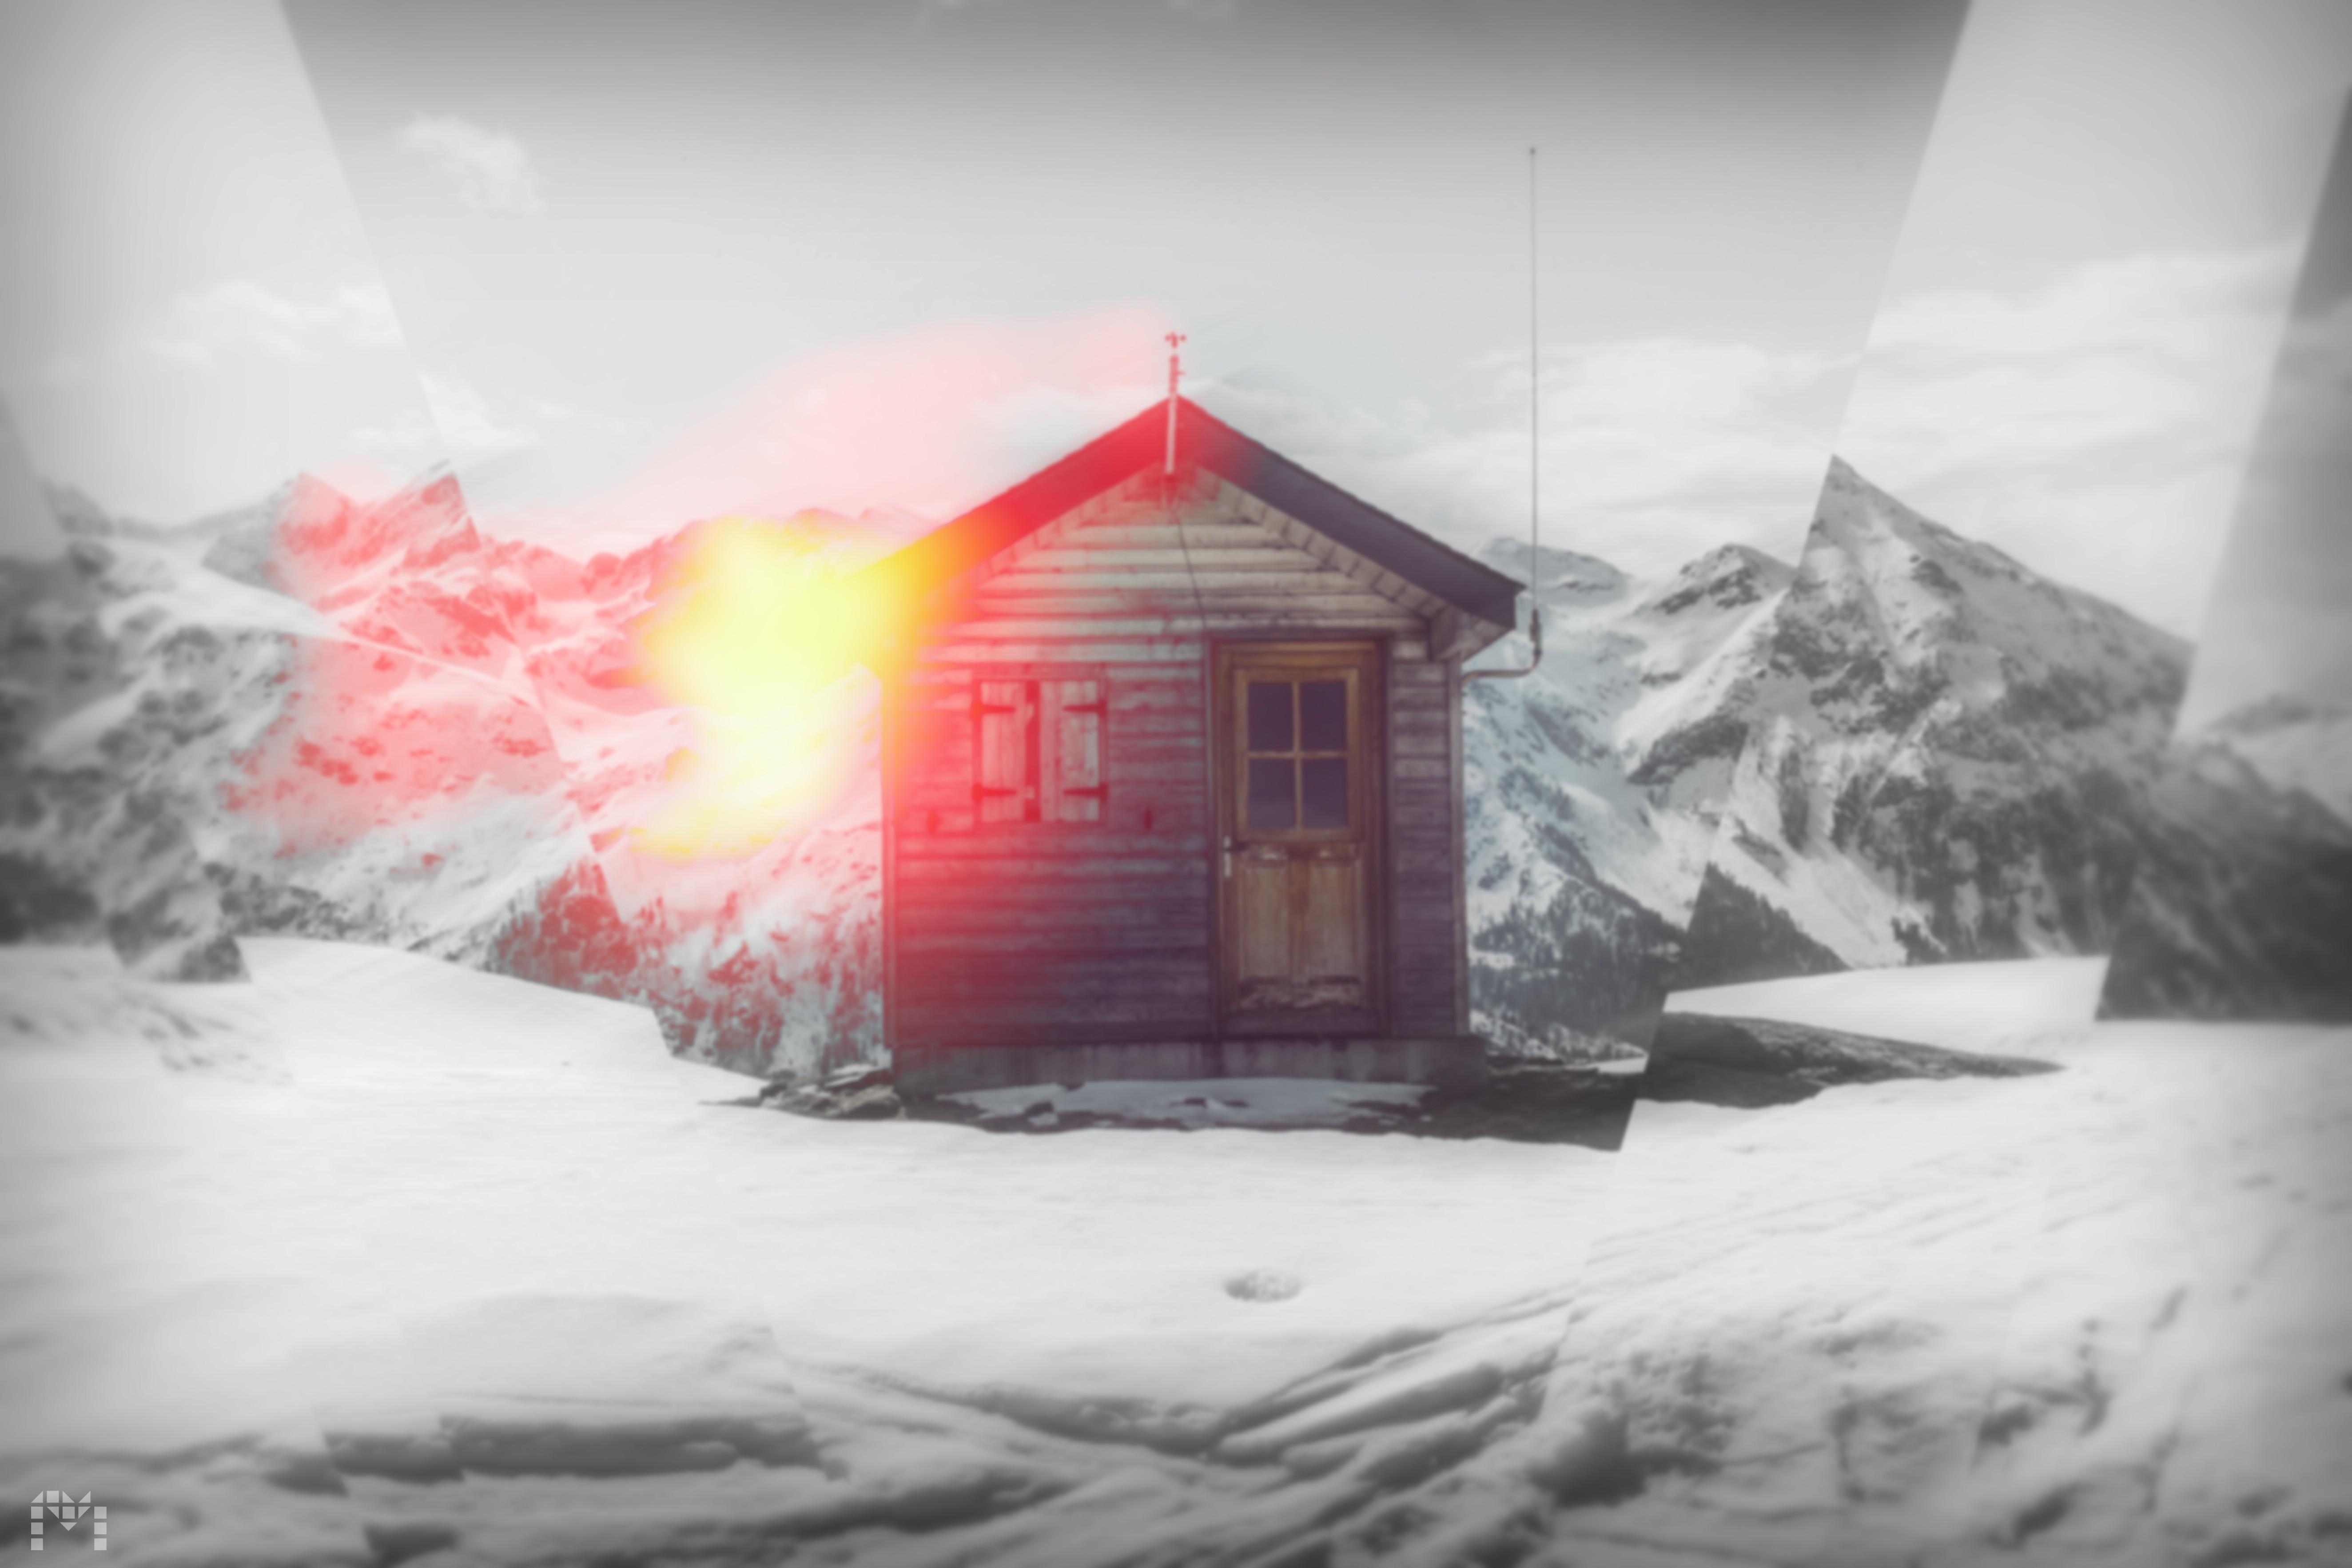 Fondos de pantalla dibujo pintura monta as invierno - Exterior painting in cold weather ...